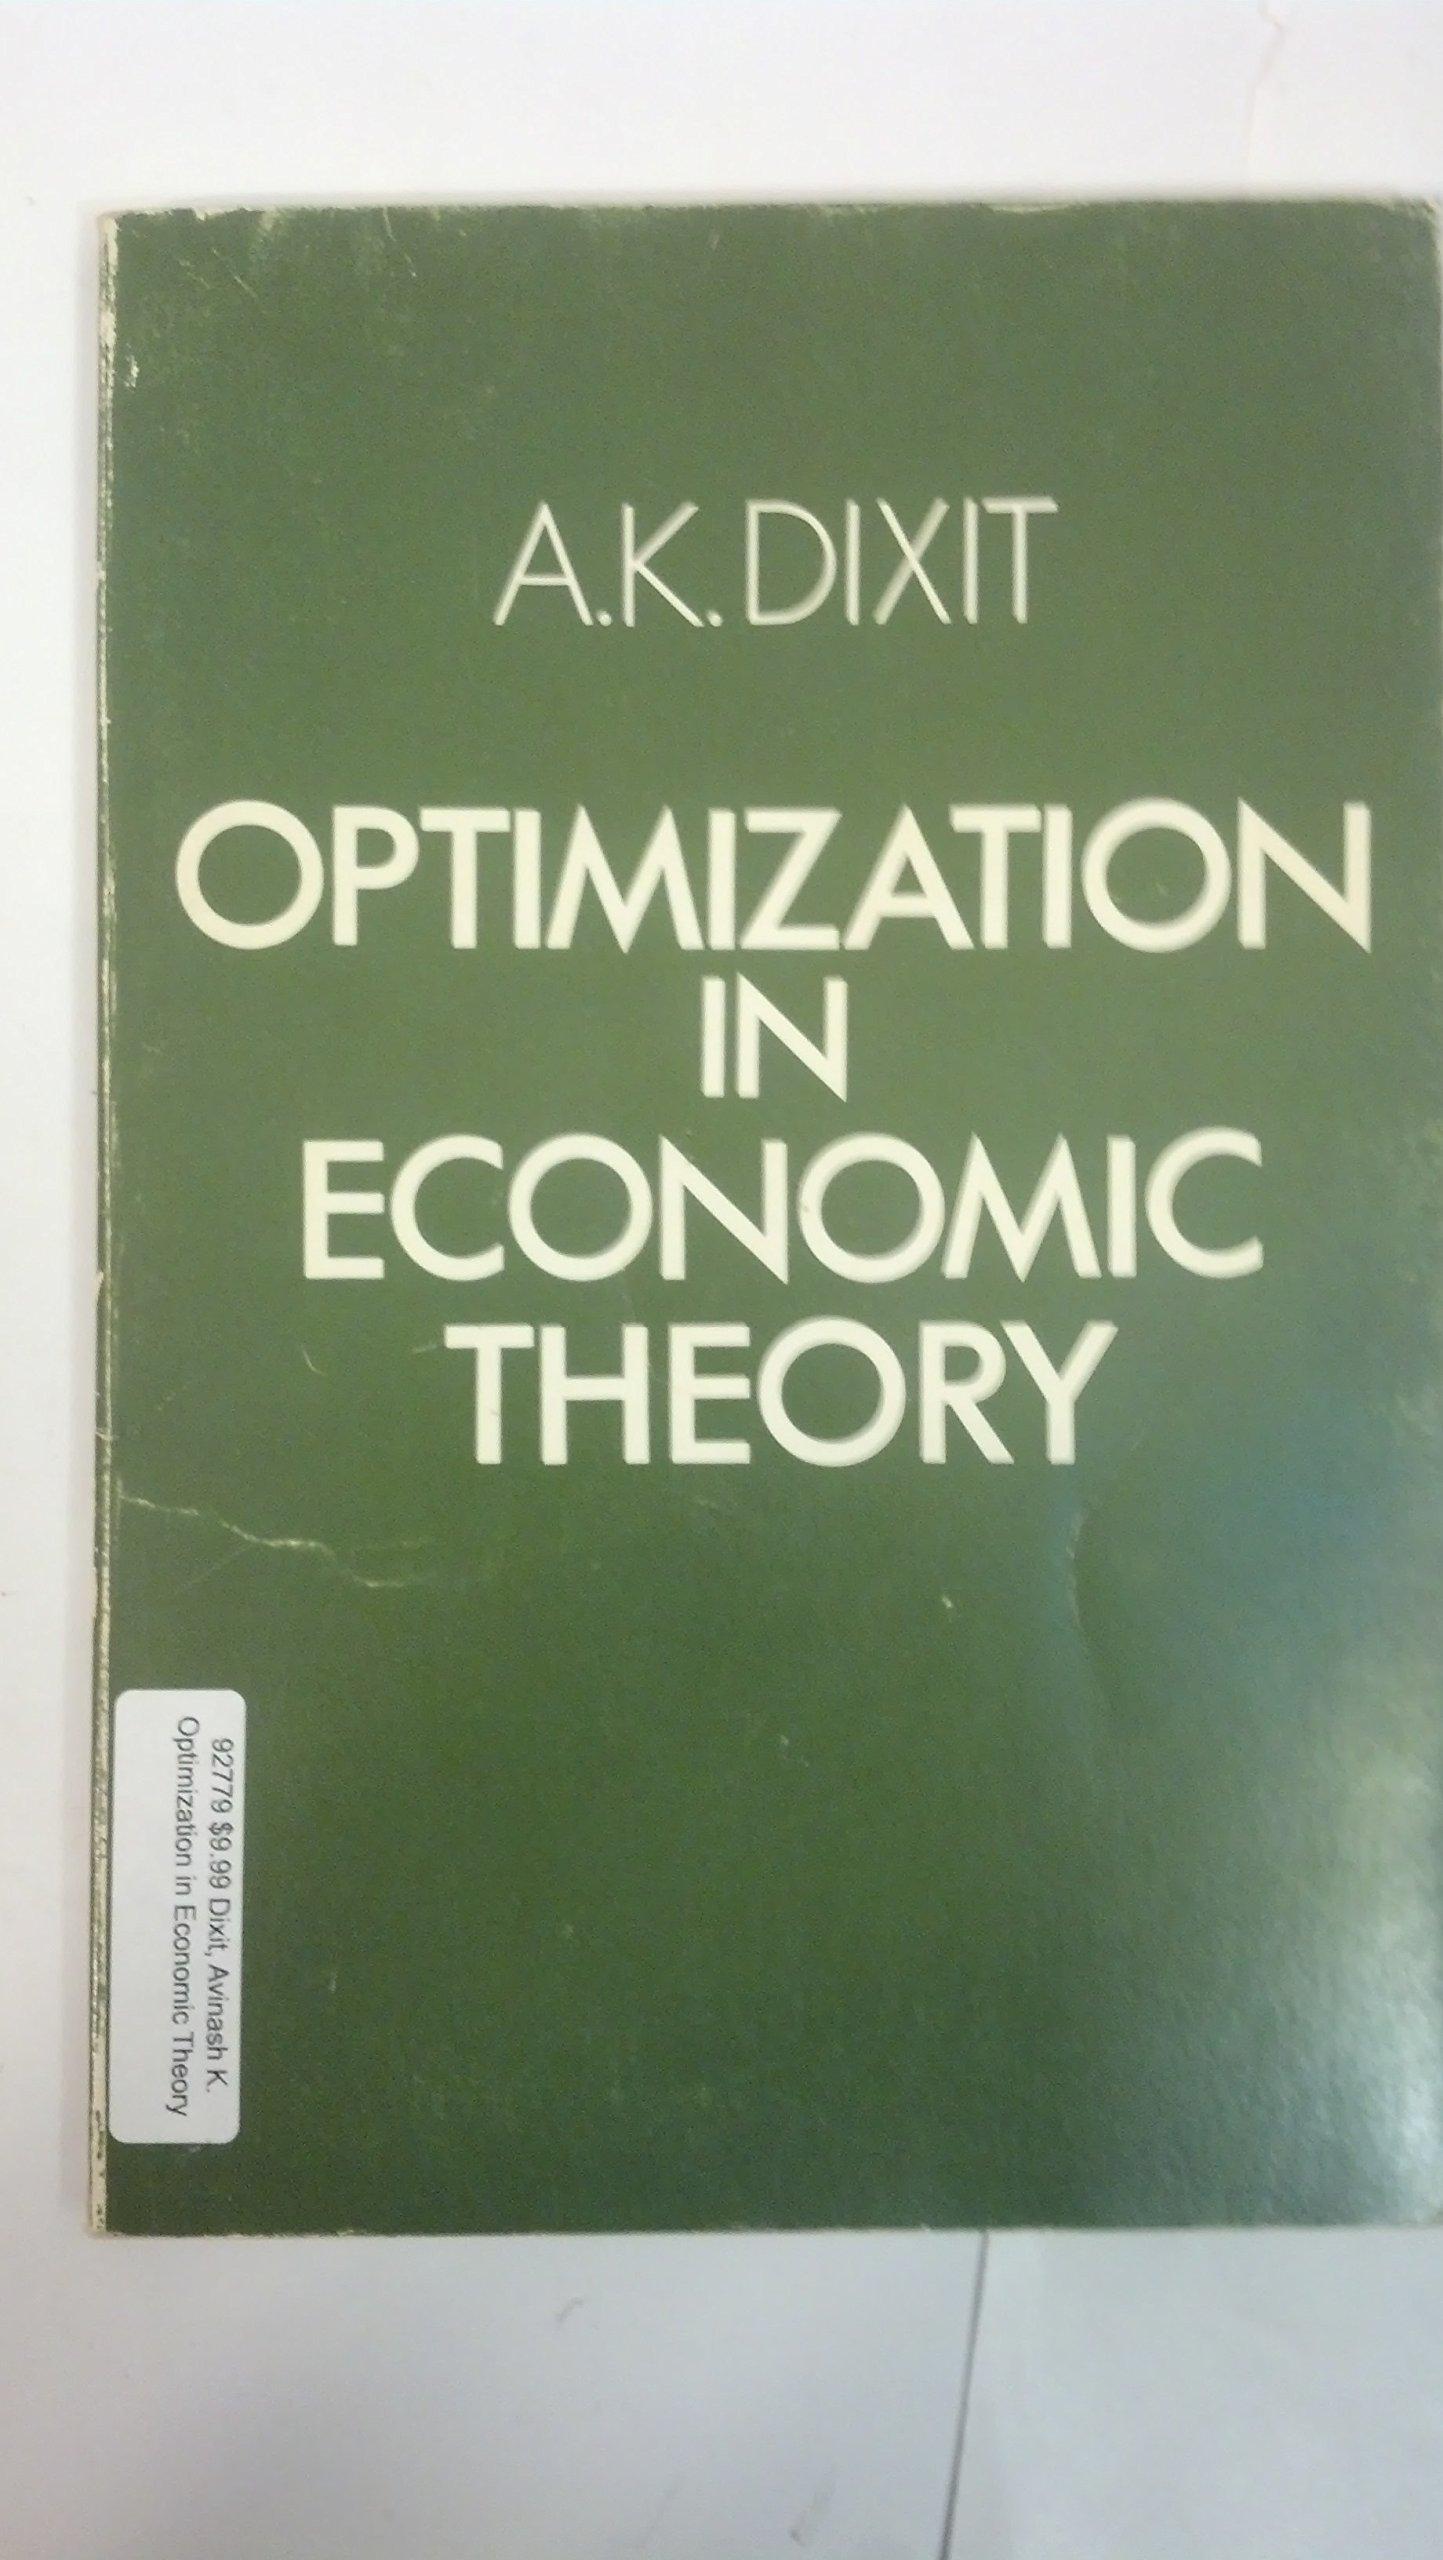 Optimization in Economic Theory: Amazon.es: Avinash K. Dixit: Libros en idiomas extranjeros